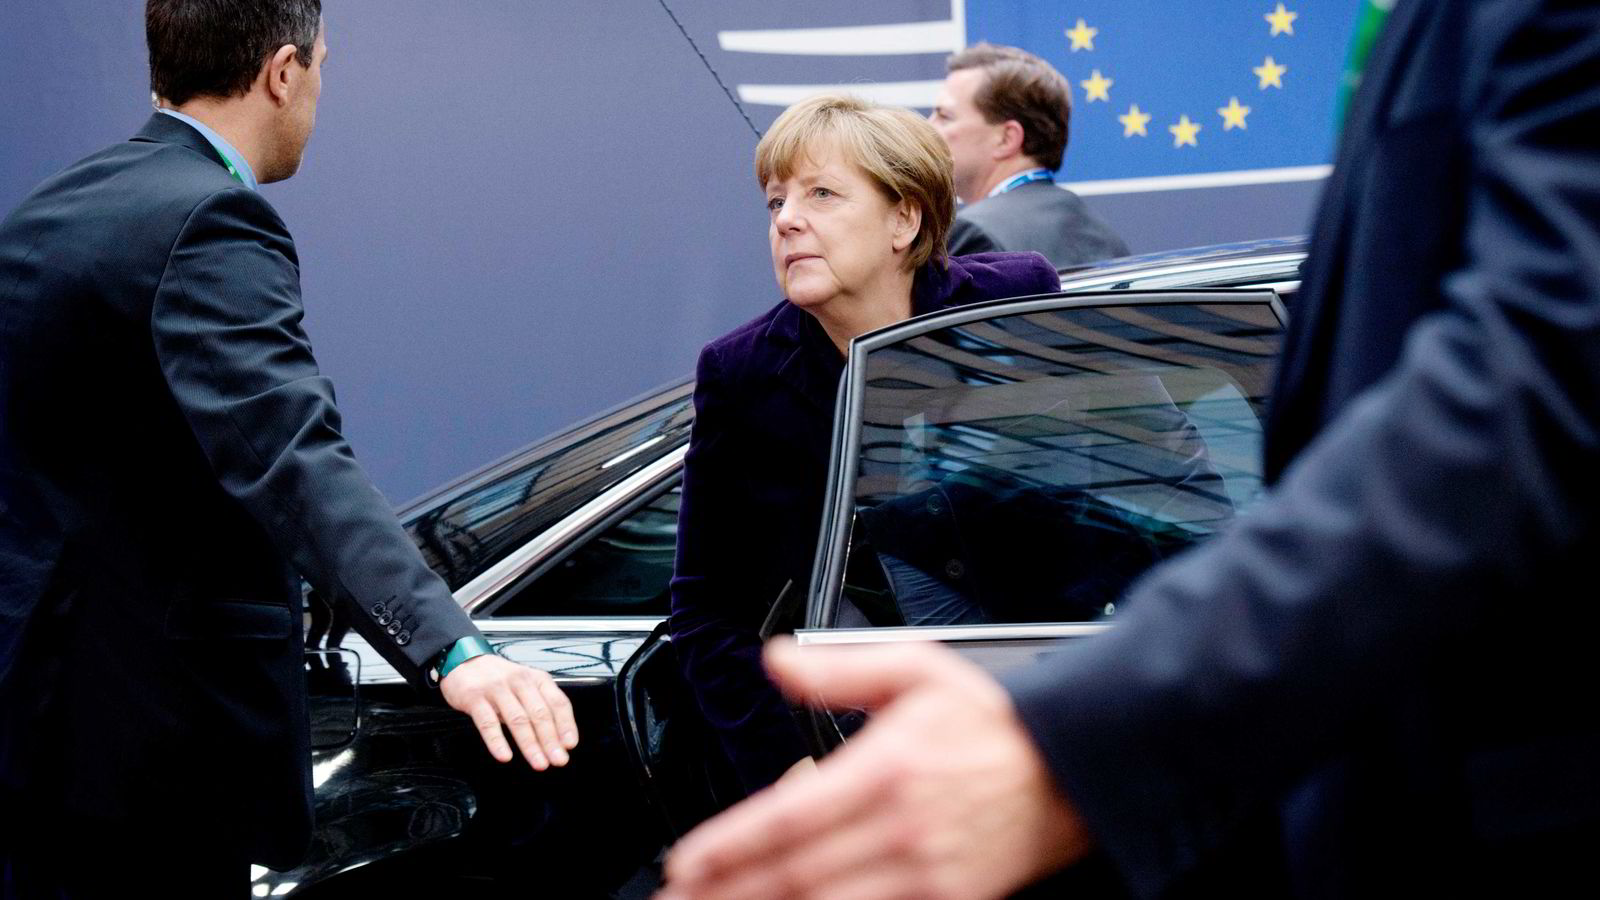 Tysklands forbundskansler Angela Merkel ankommer EU-toppmøtet. Foto: Geert Wijngaert, Ap/NTB Scanpix